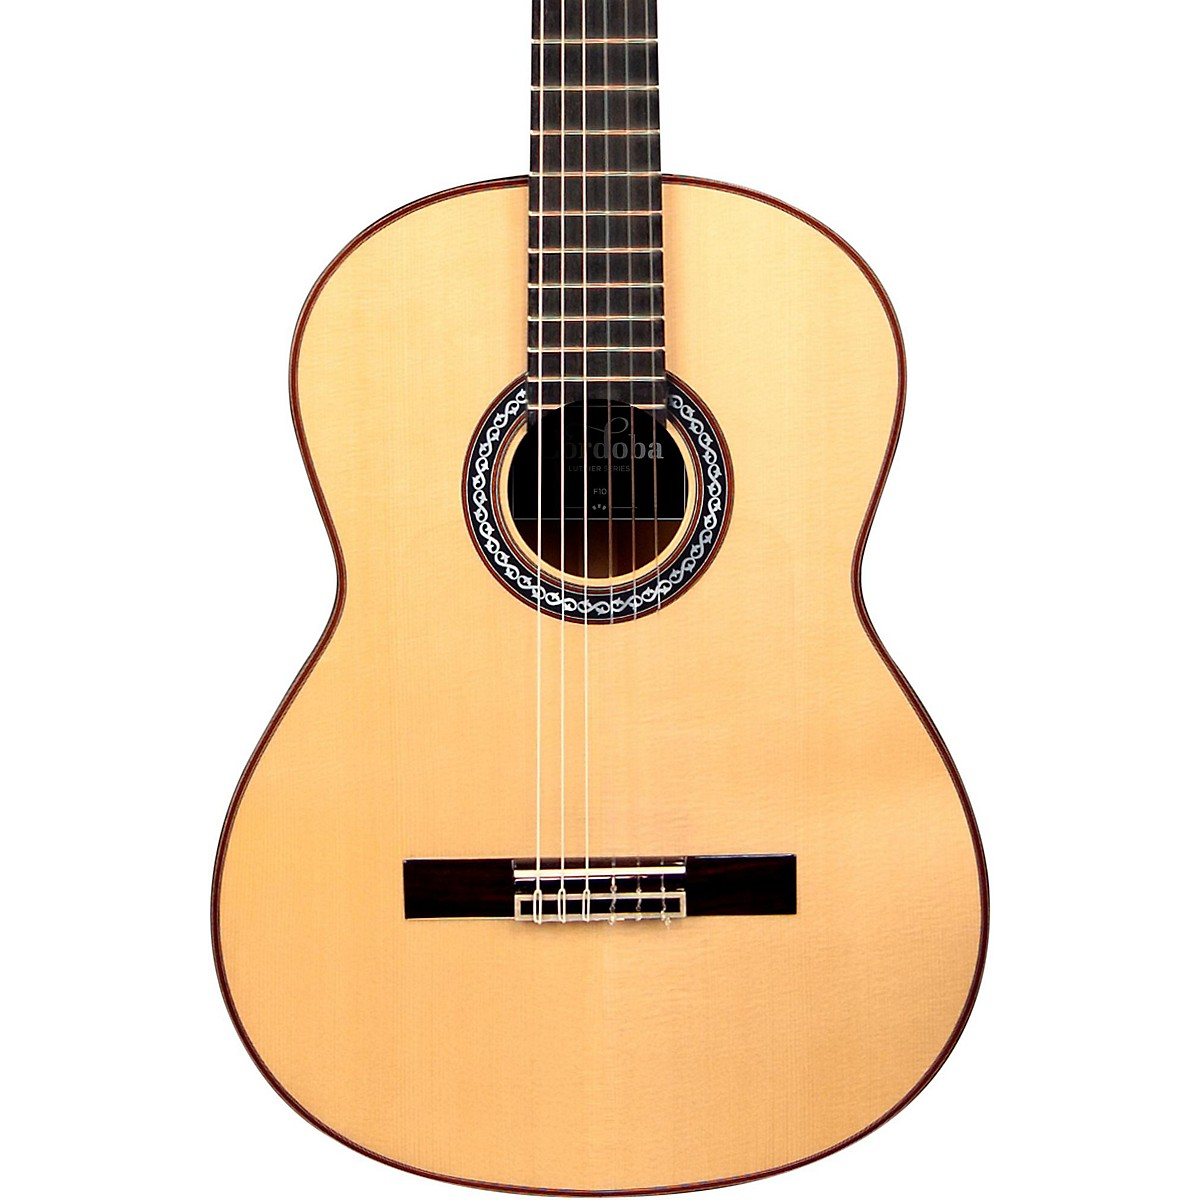 Cordoba F10 Nylon String Acoustic Guitar